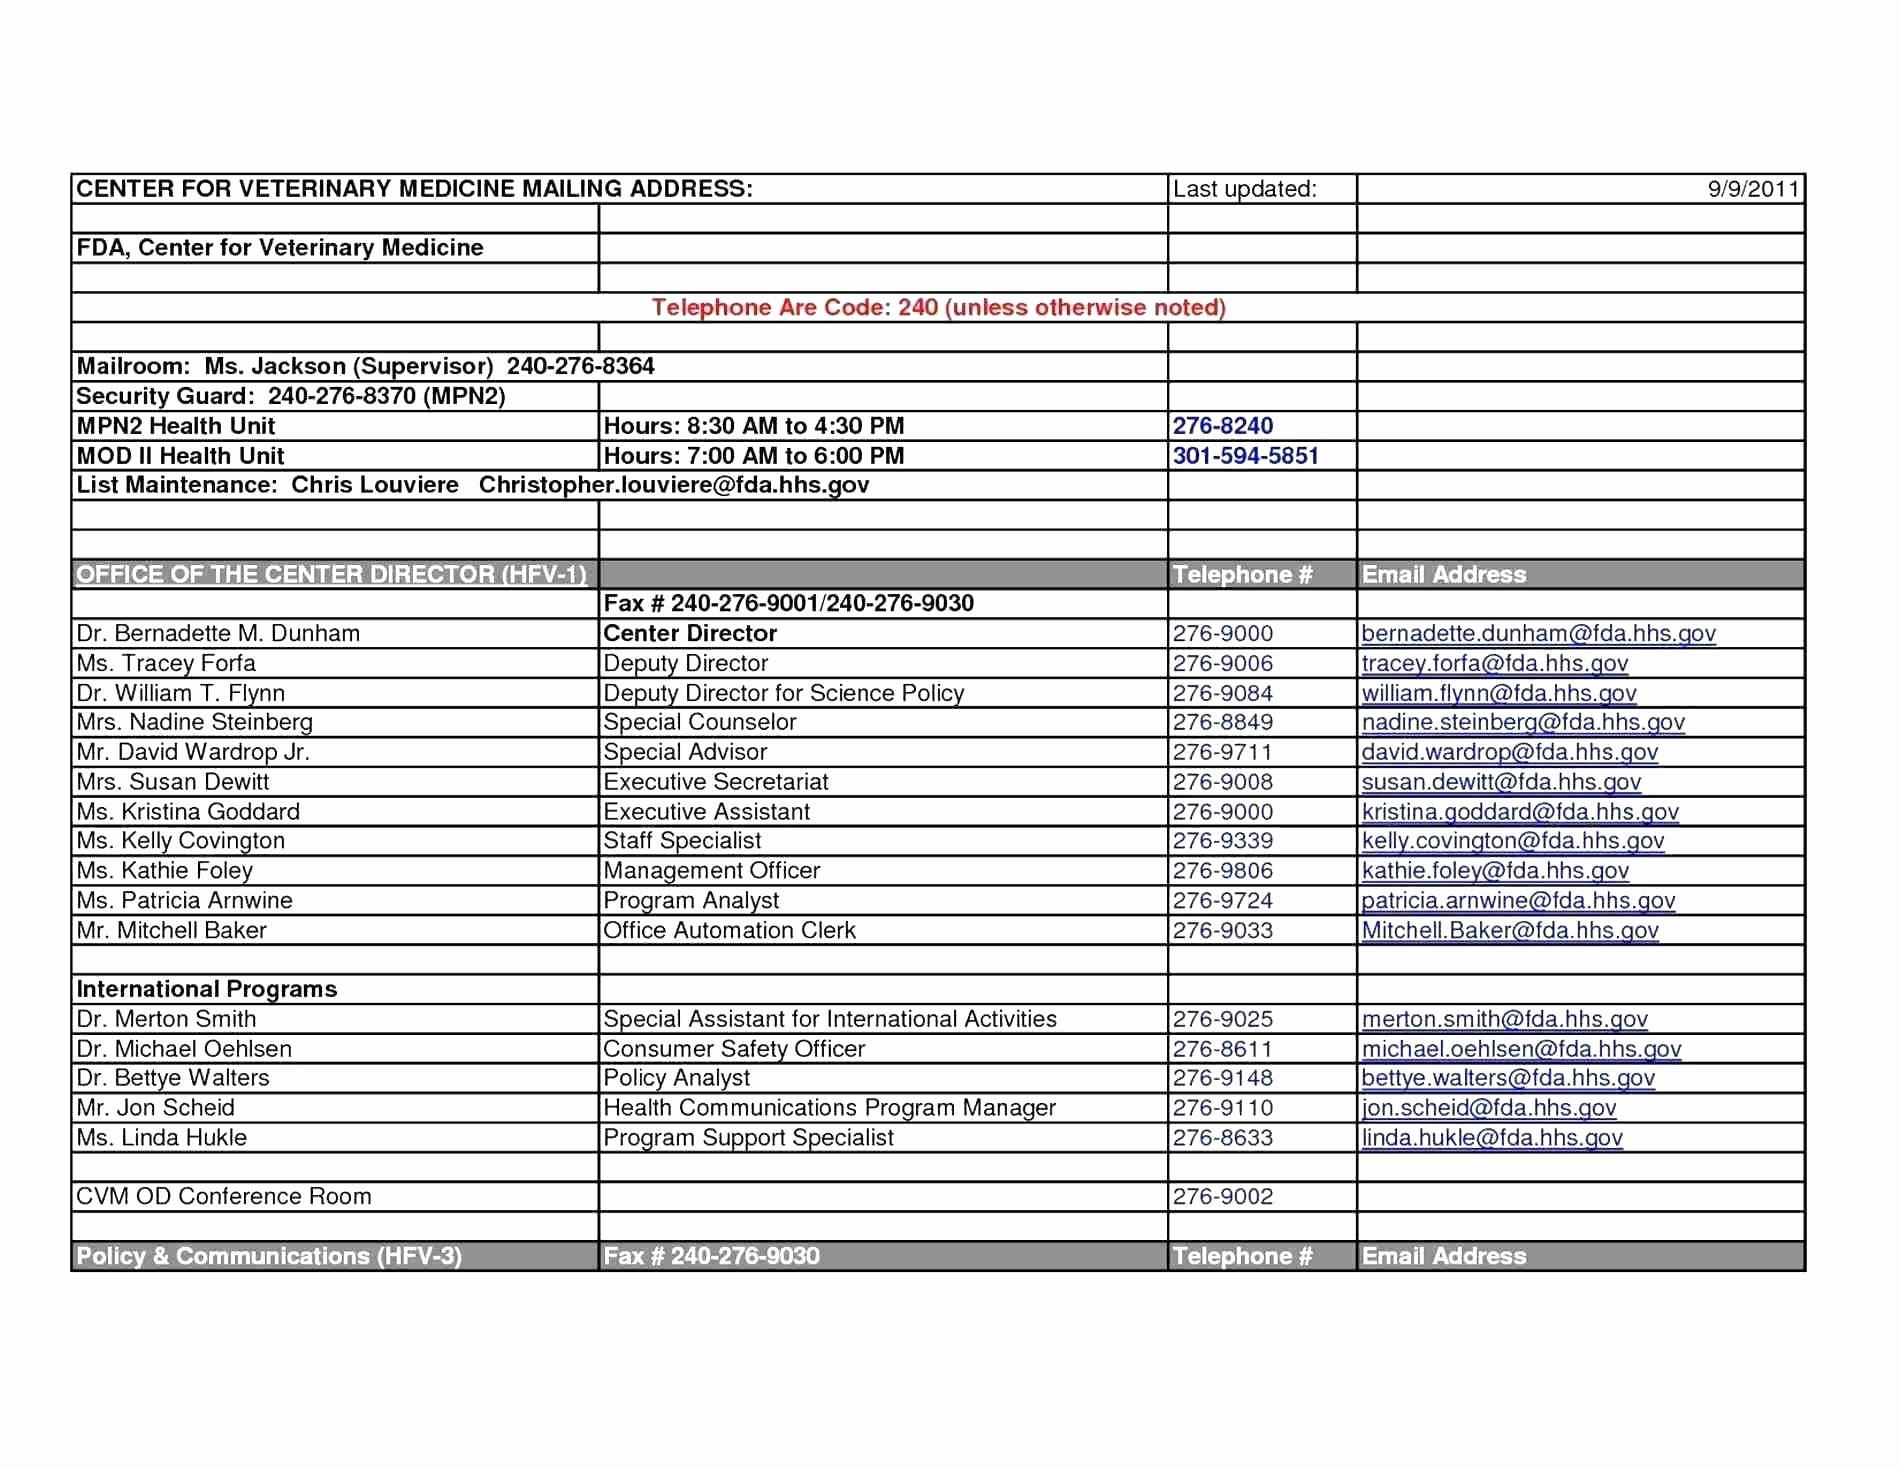 Cap Table Excel Spreadsheet – Spreadsheet Collections Regarding Ncci Edits 2018 Excel Spreadsheet